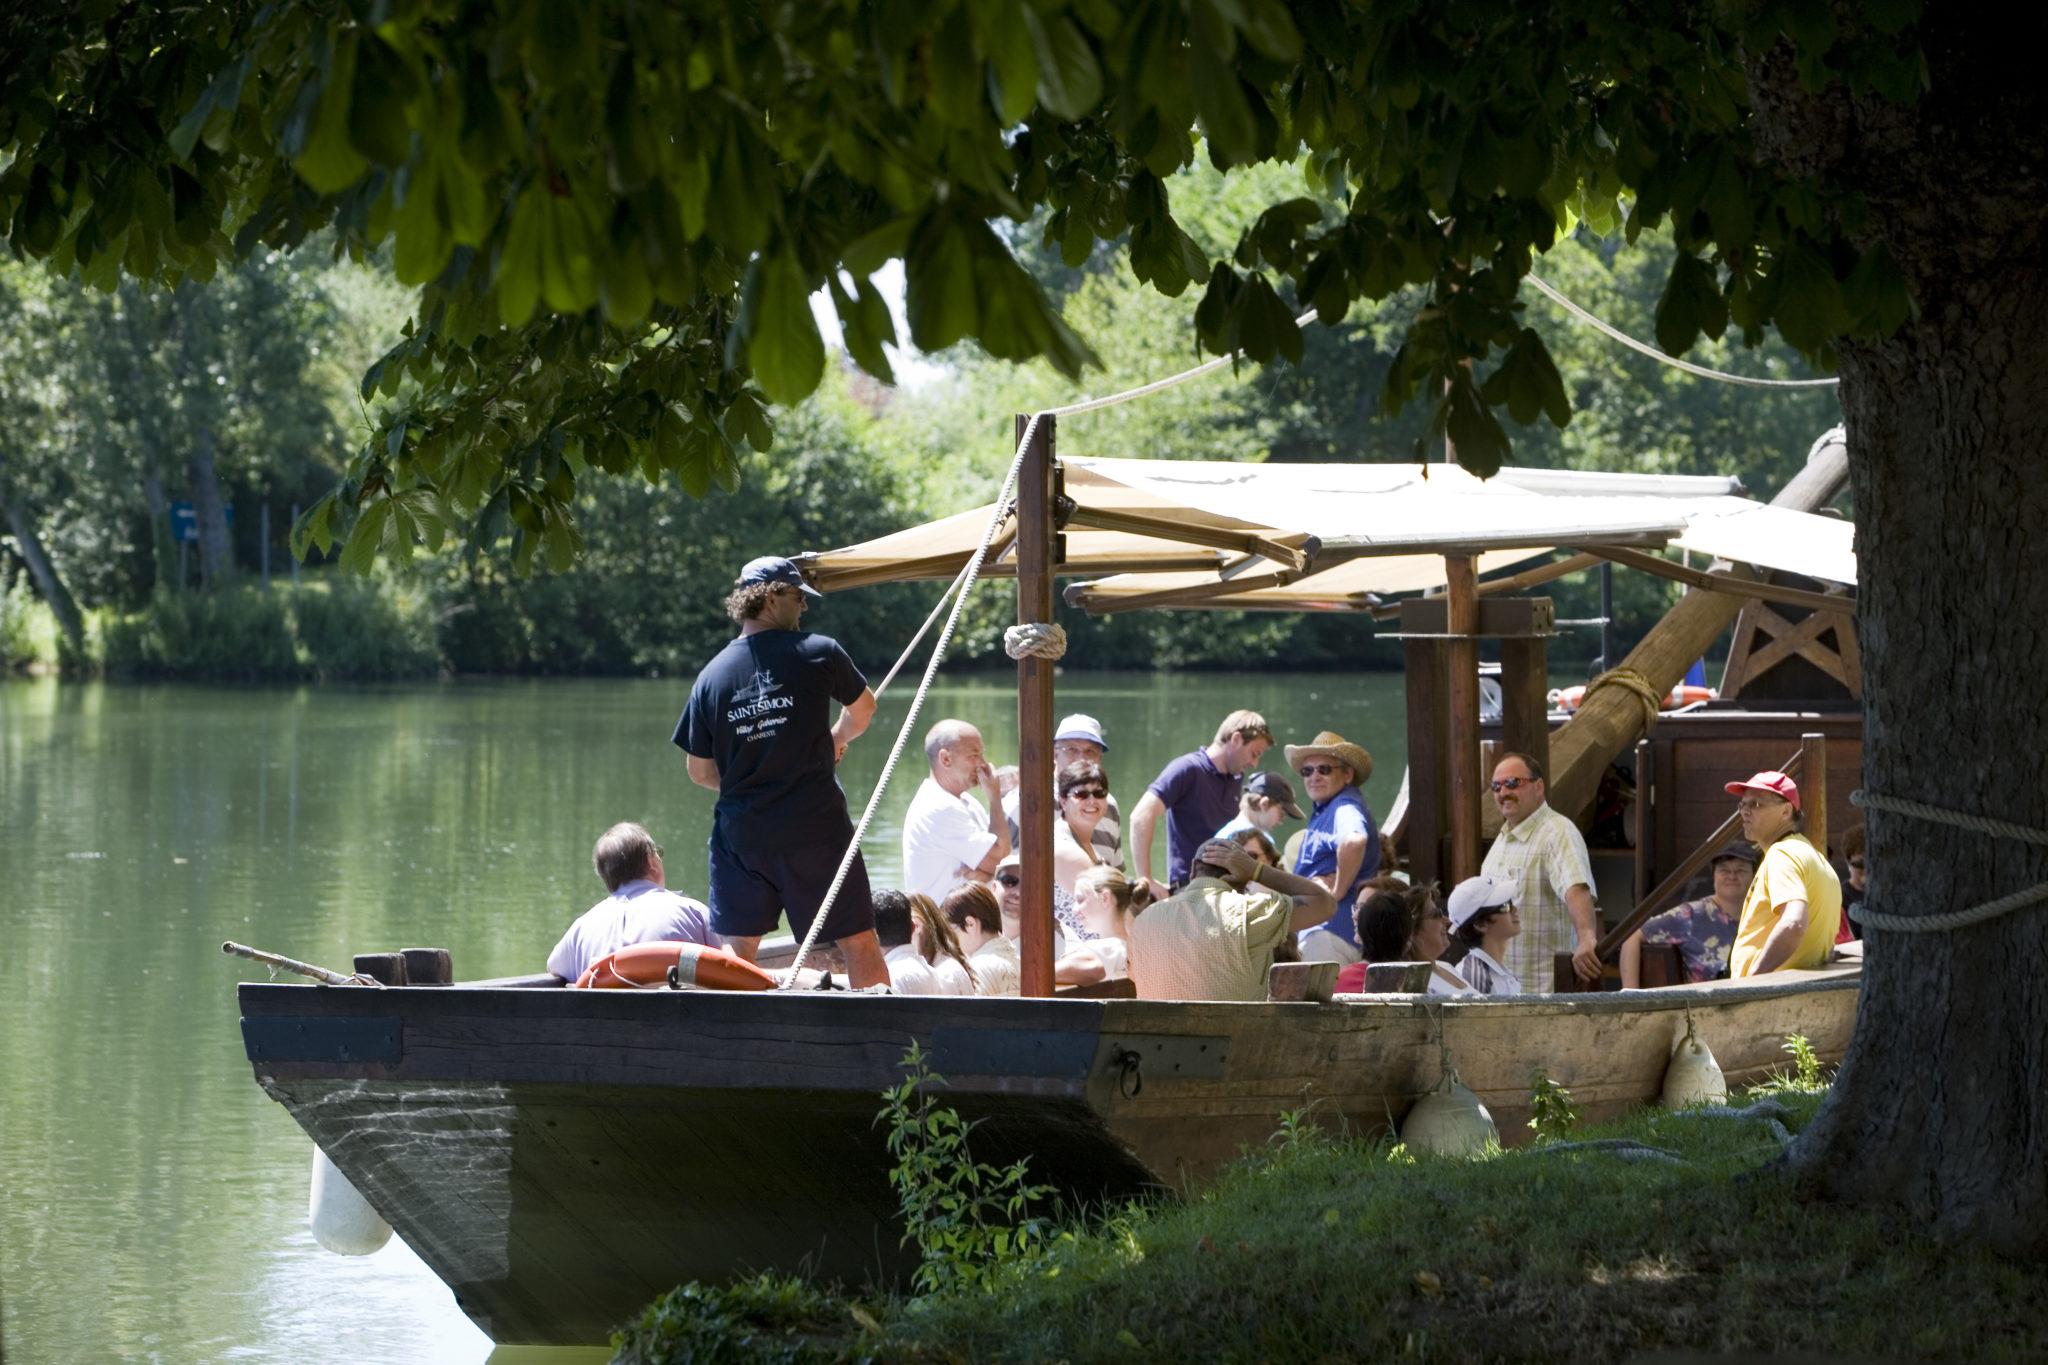 Balade en gabarre sur le fleuve Charente en groupe